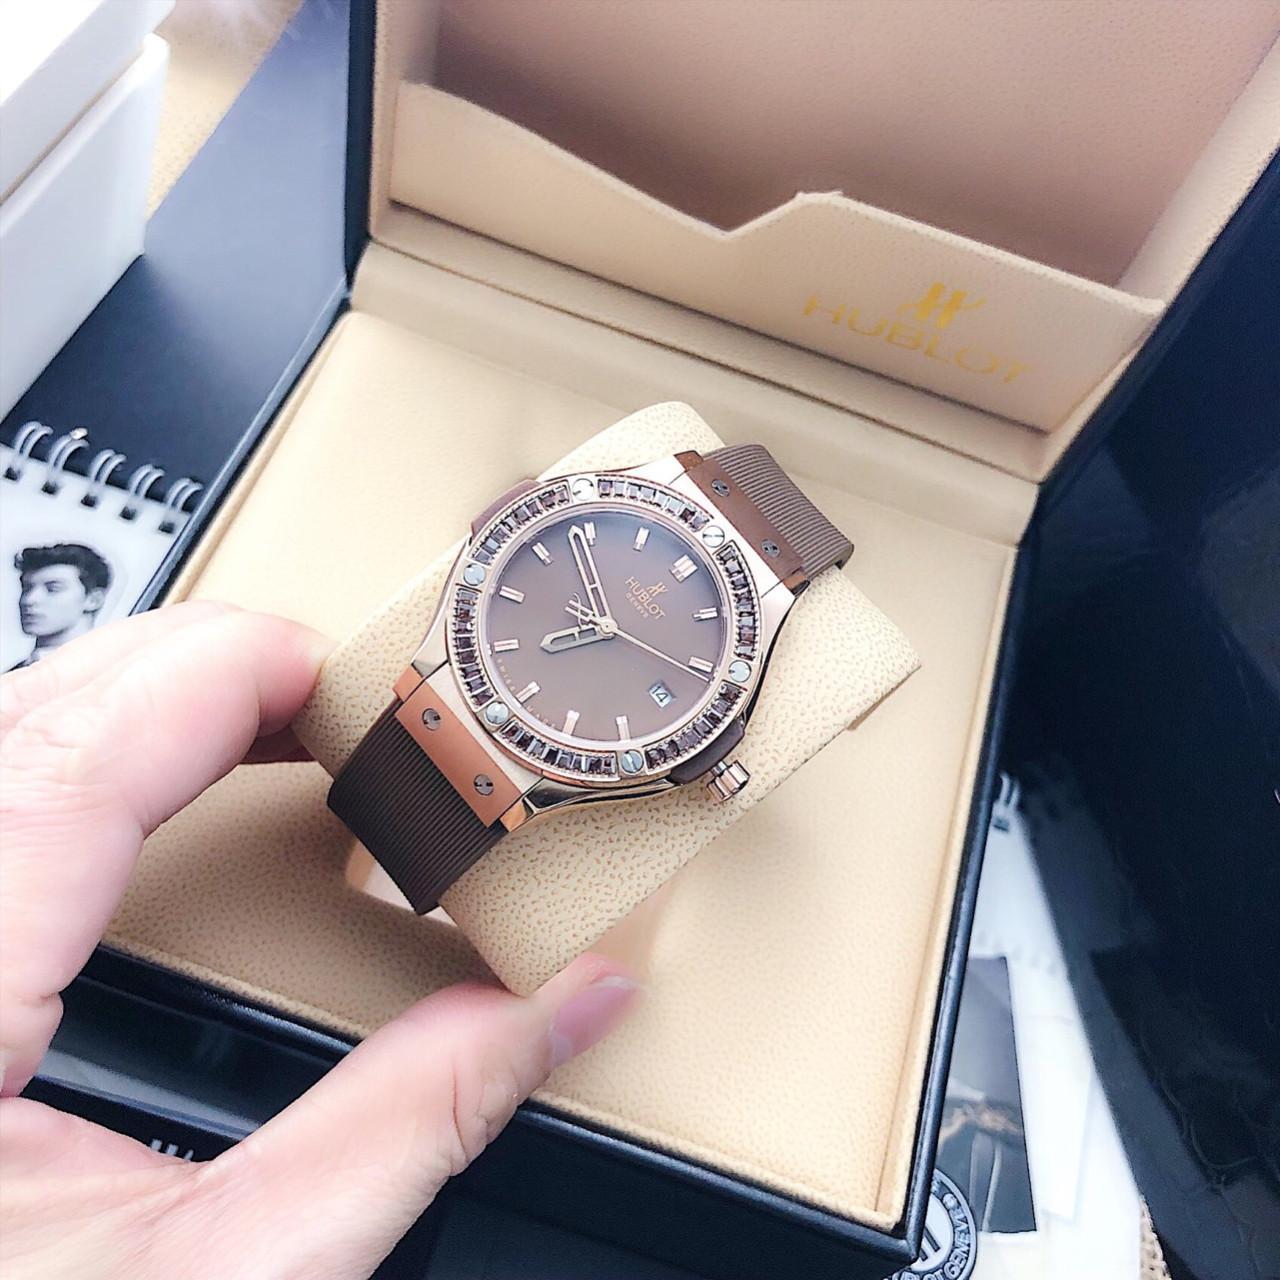 Nơi bán Đồng Hồ Nữ Hublot Diamond FS0039